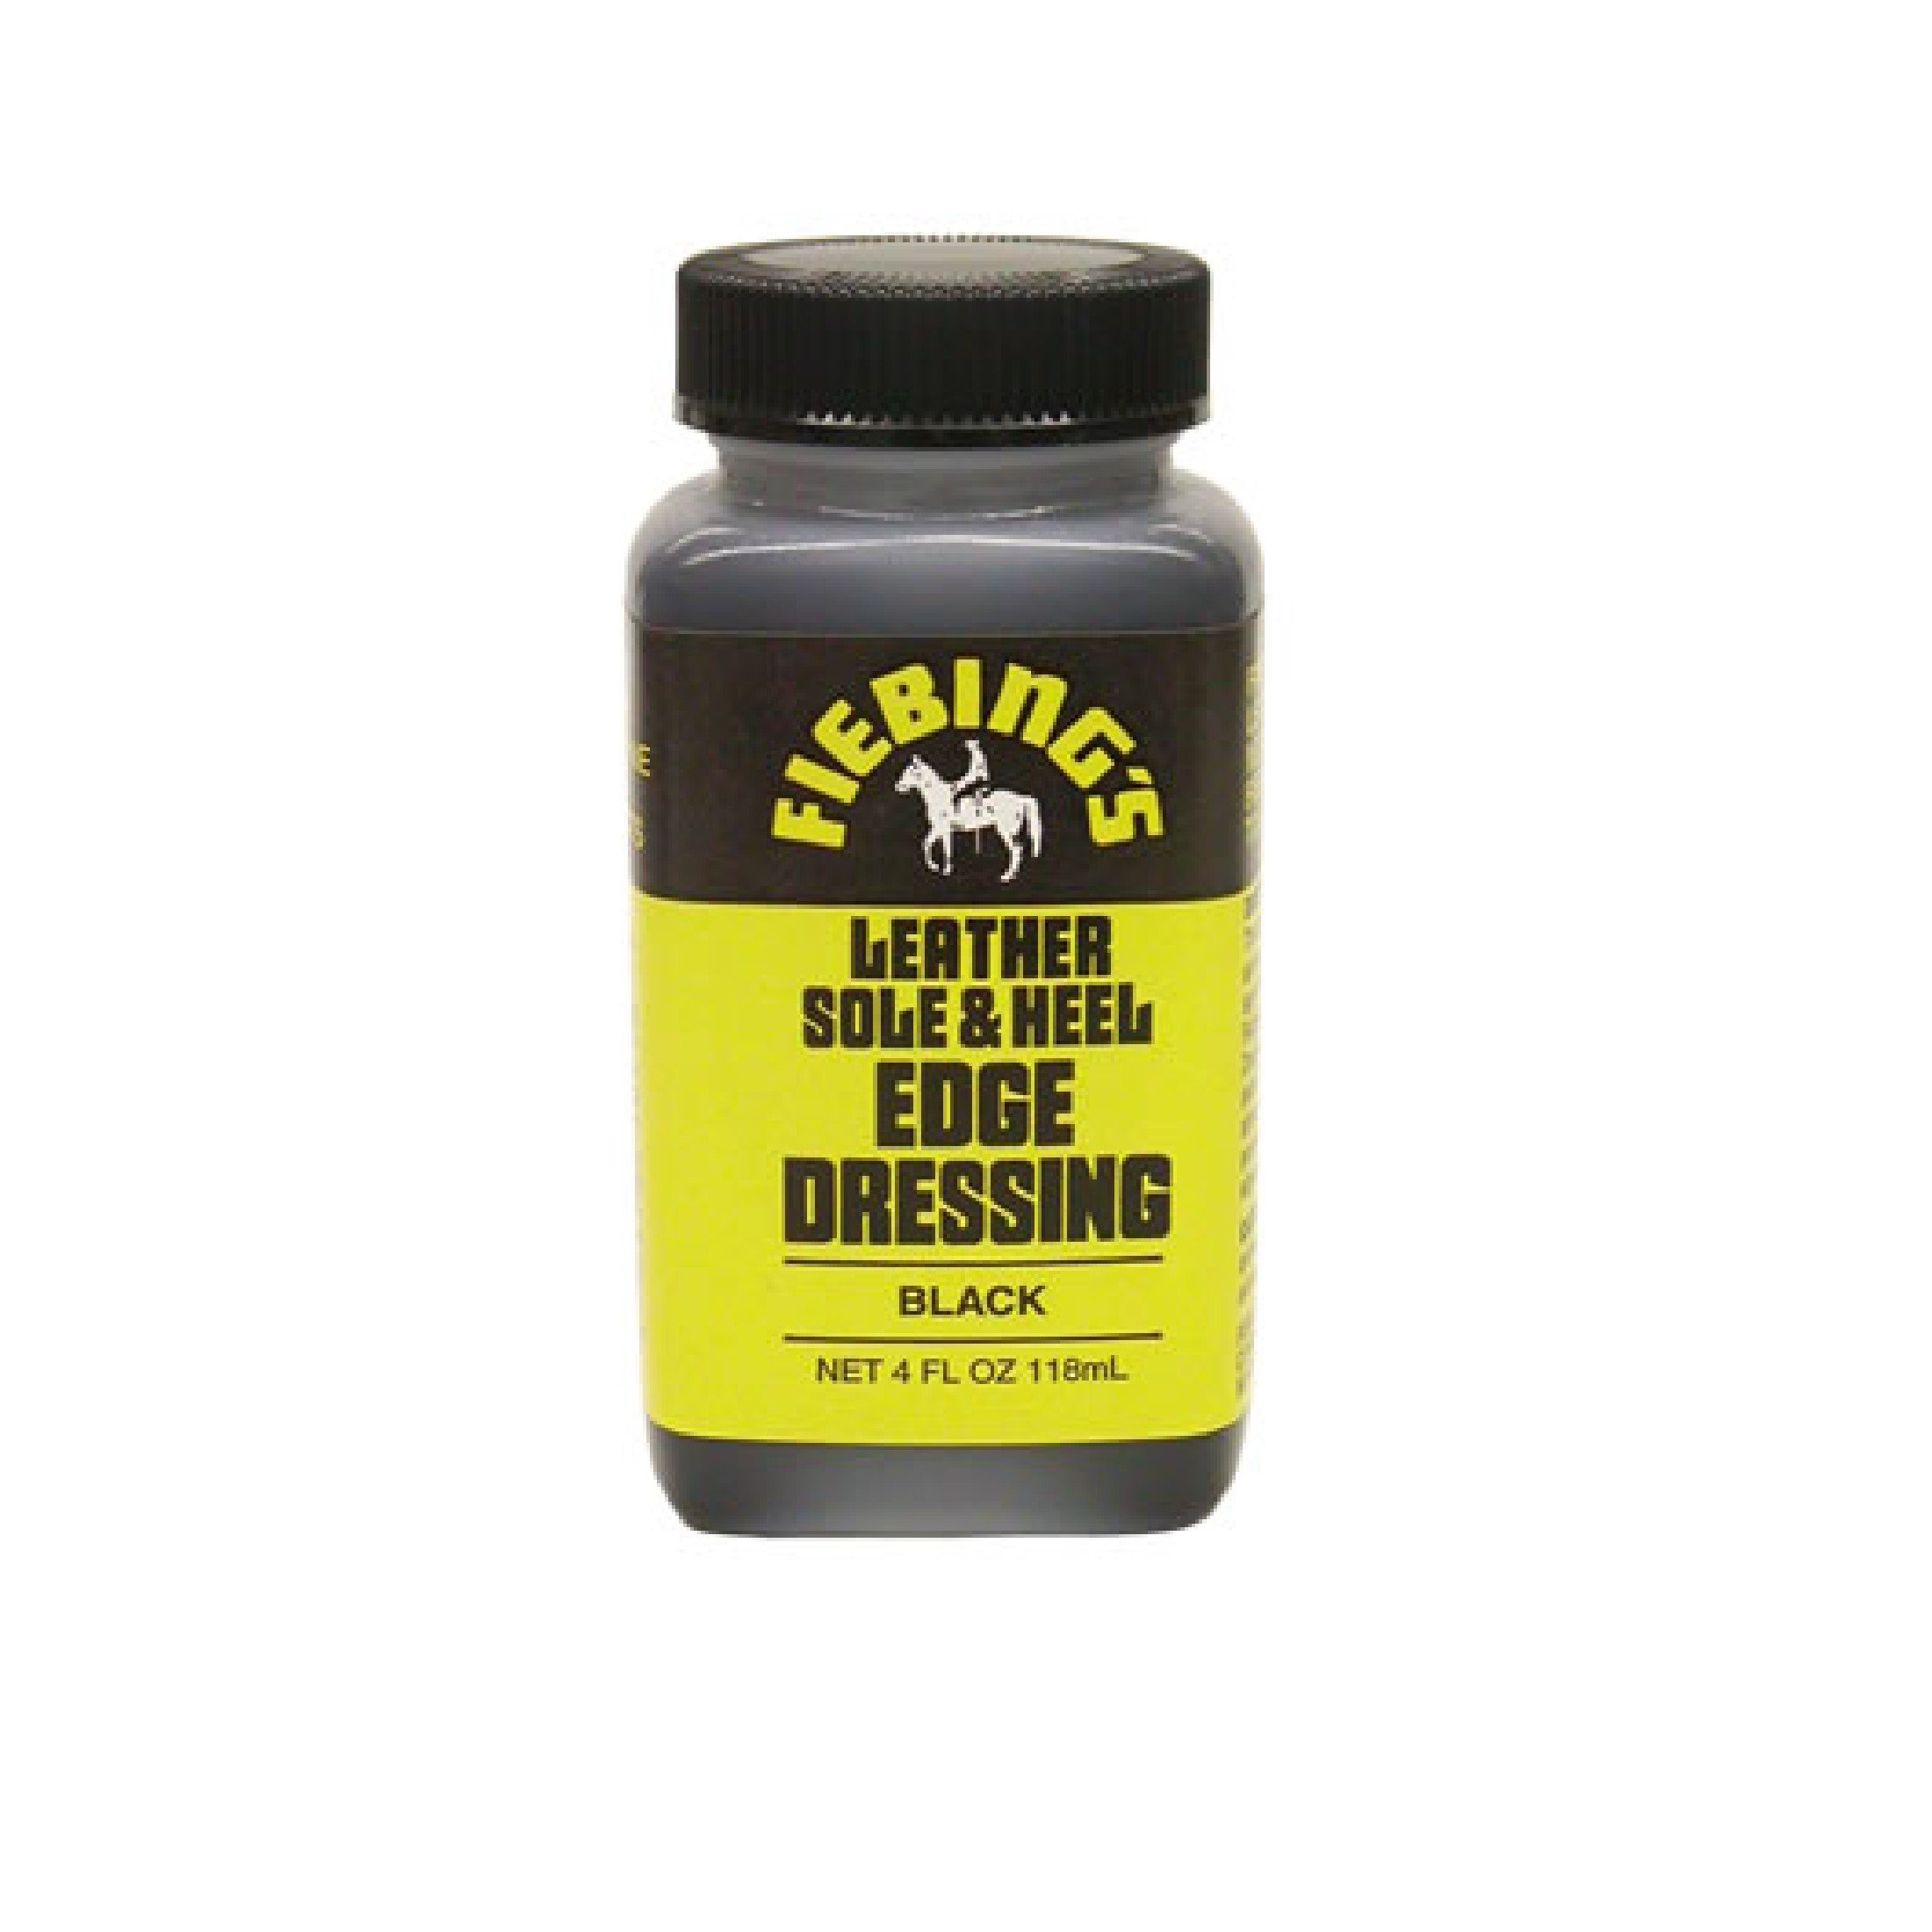 Leather Sole & Heel Edge Dressing (Black or Brown)